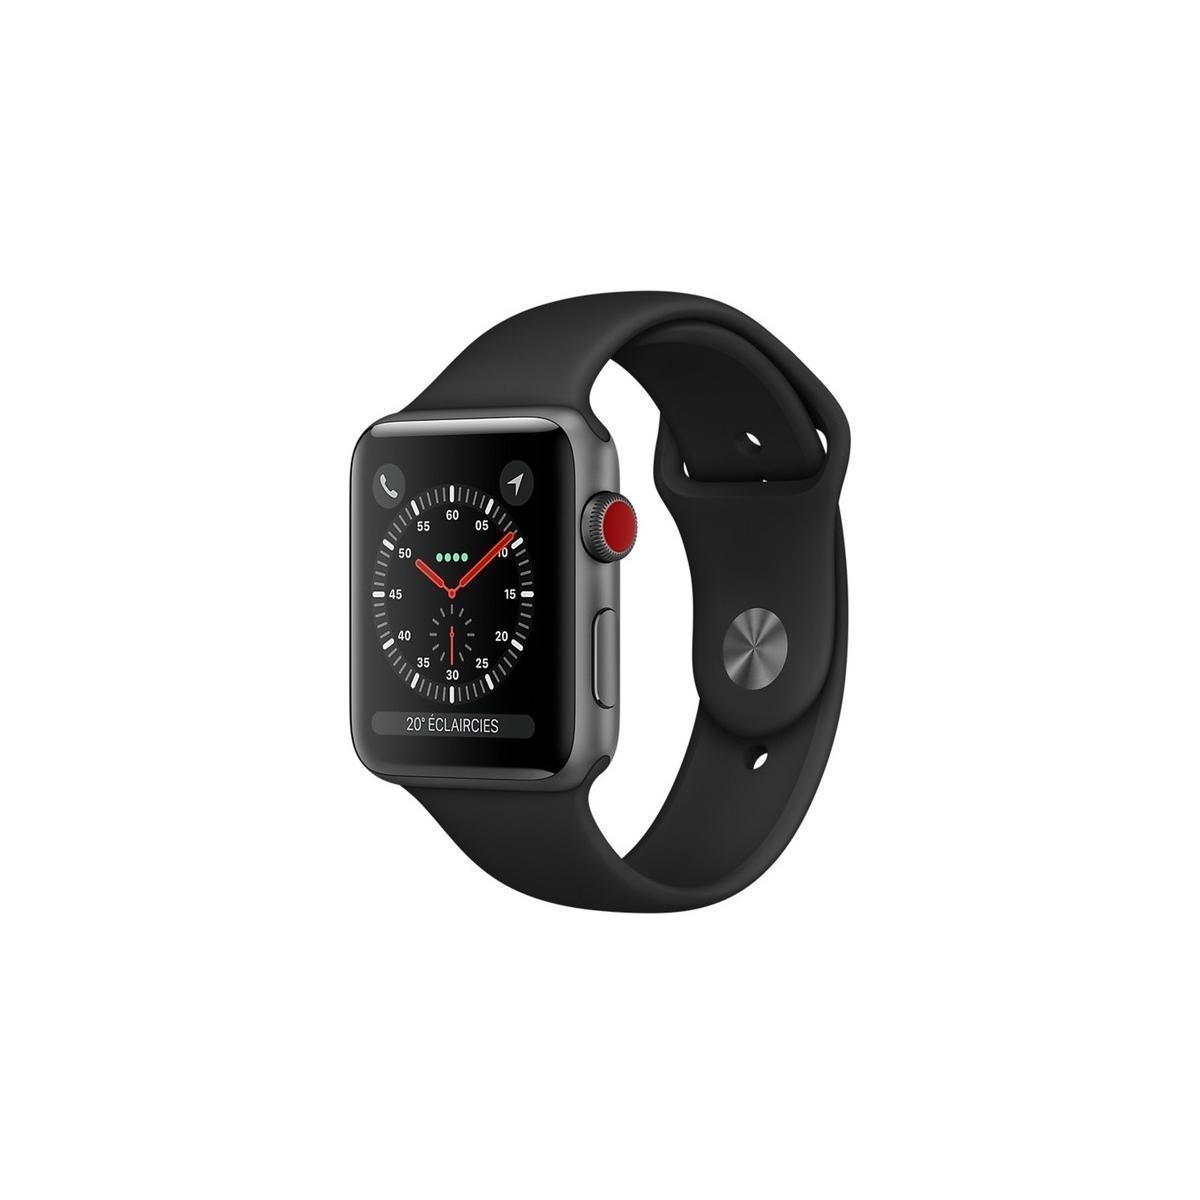 Apple Watch (Séria 3) september 2017 38mm - Hliníková Vesmírna šedá - Sport Loop Čierna